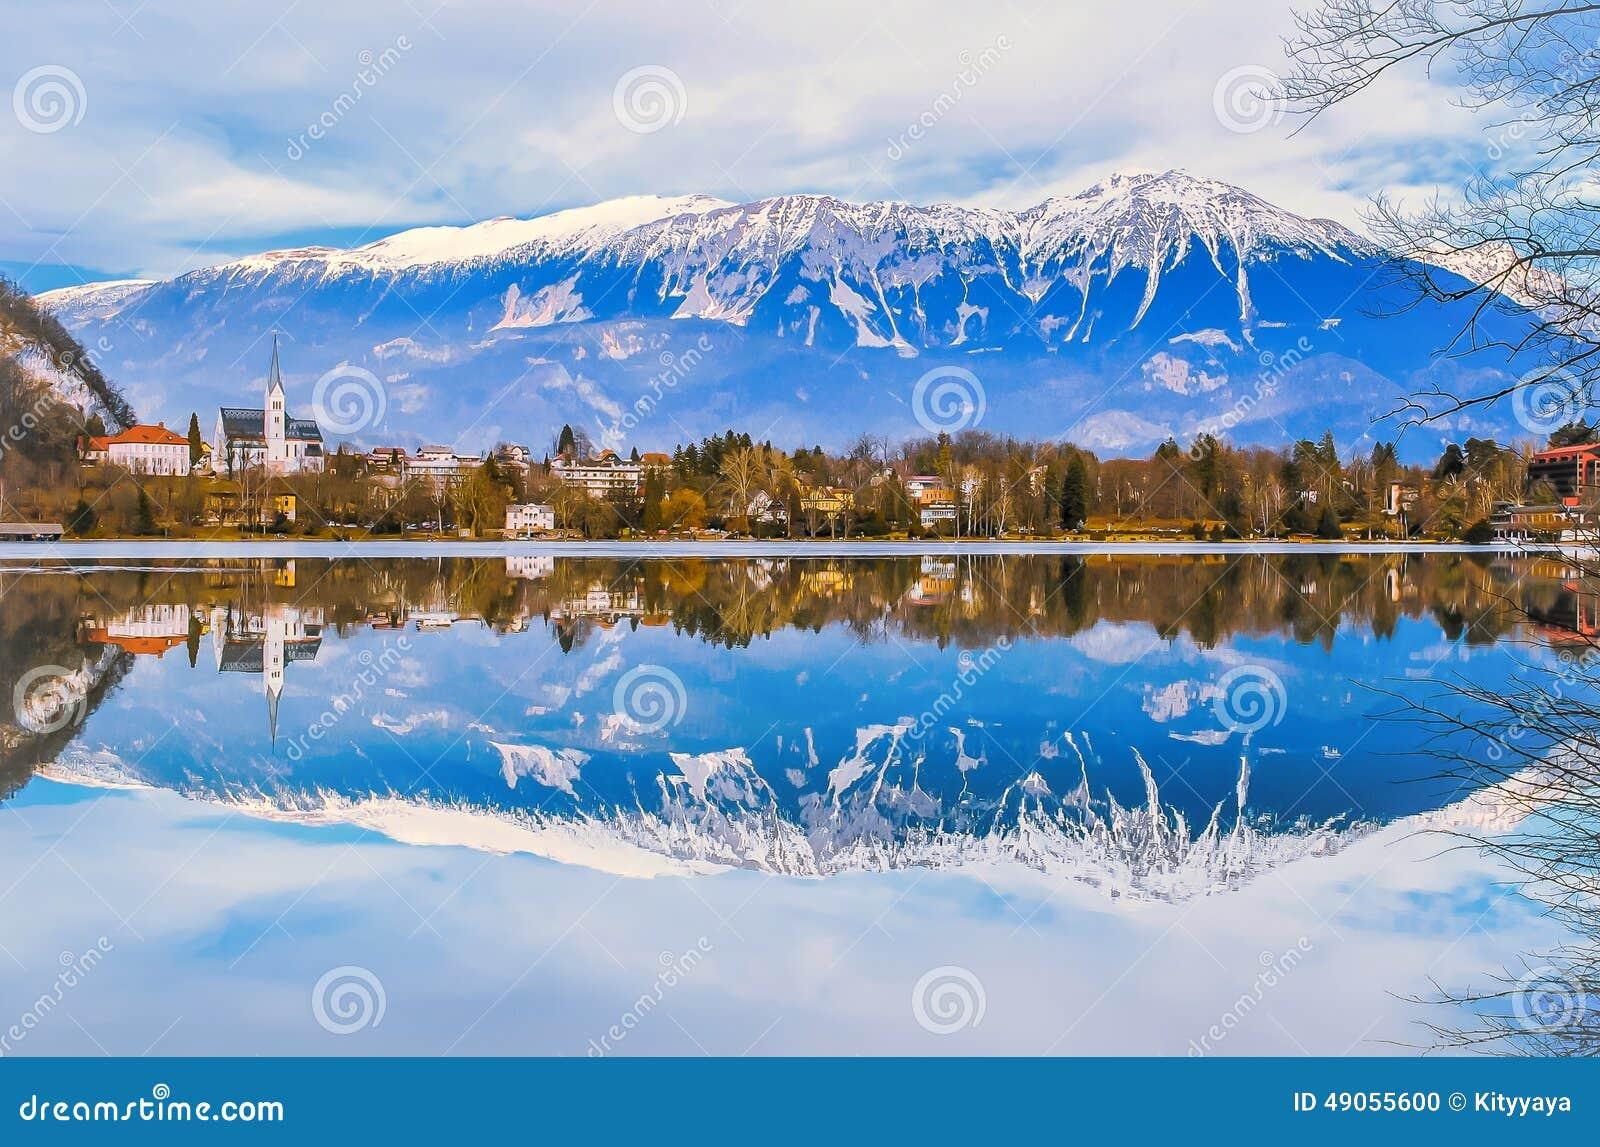 sky blue mountain reflection - photo #36